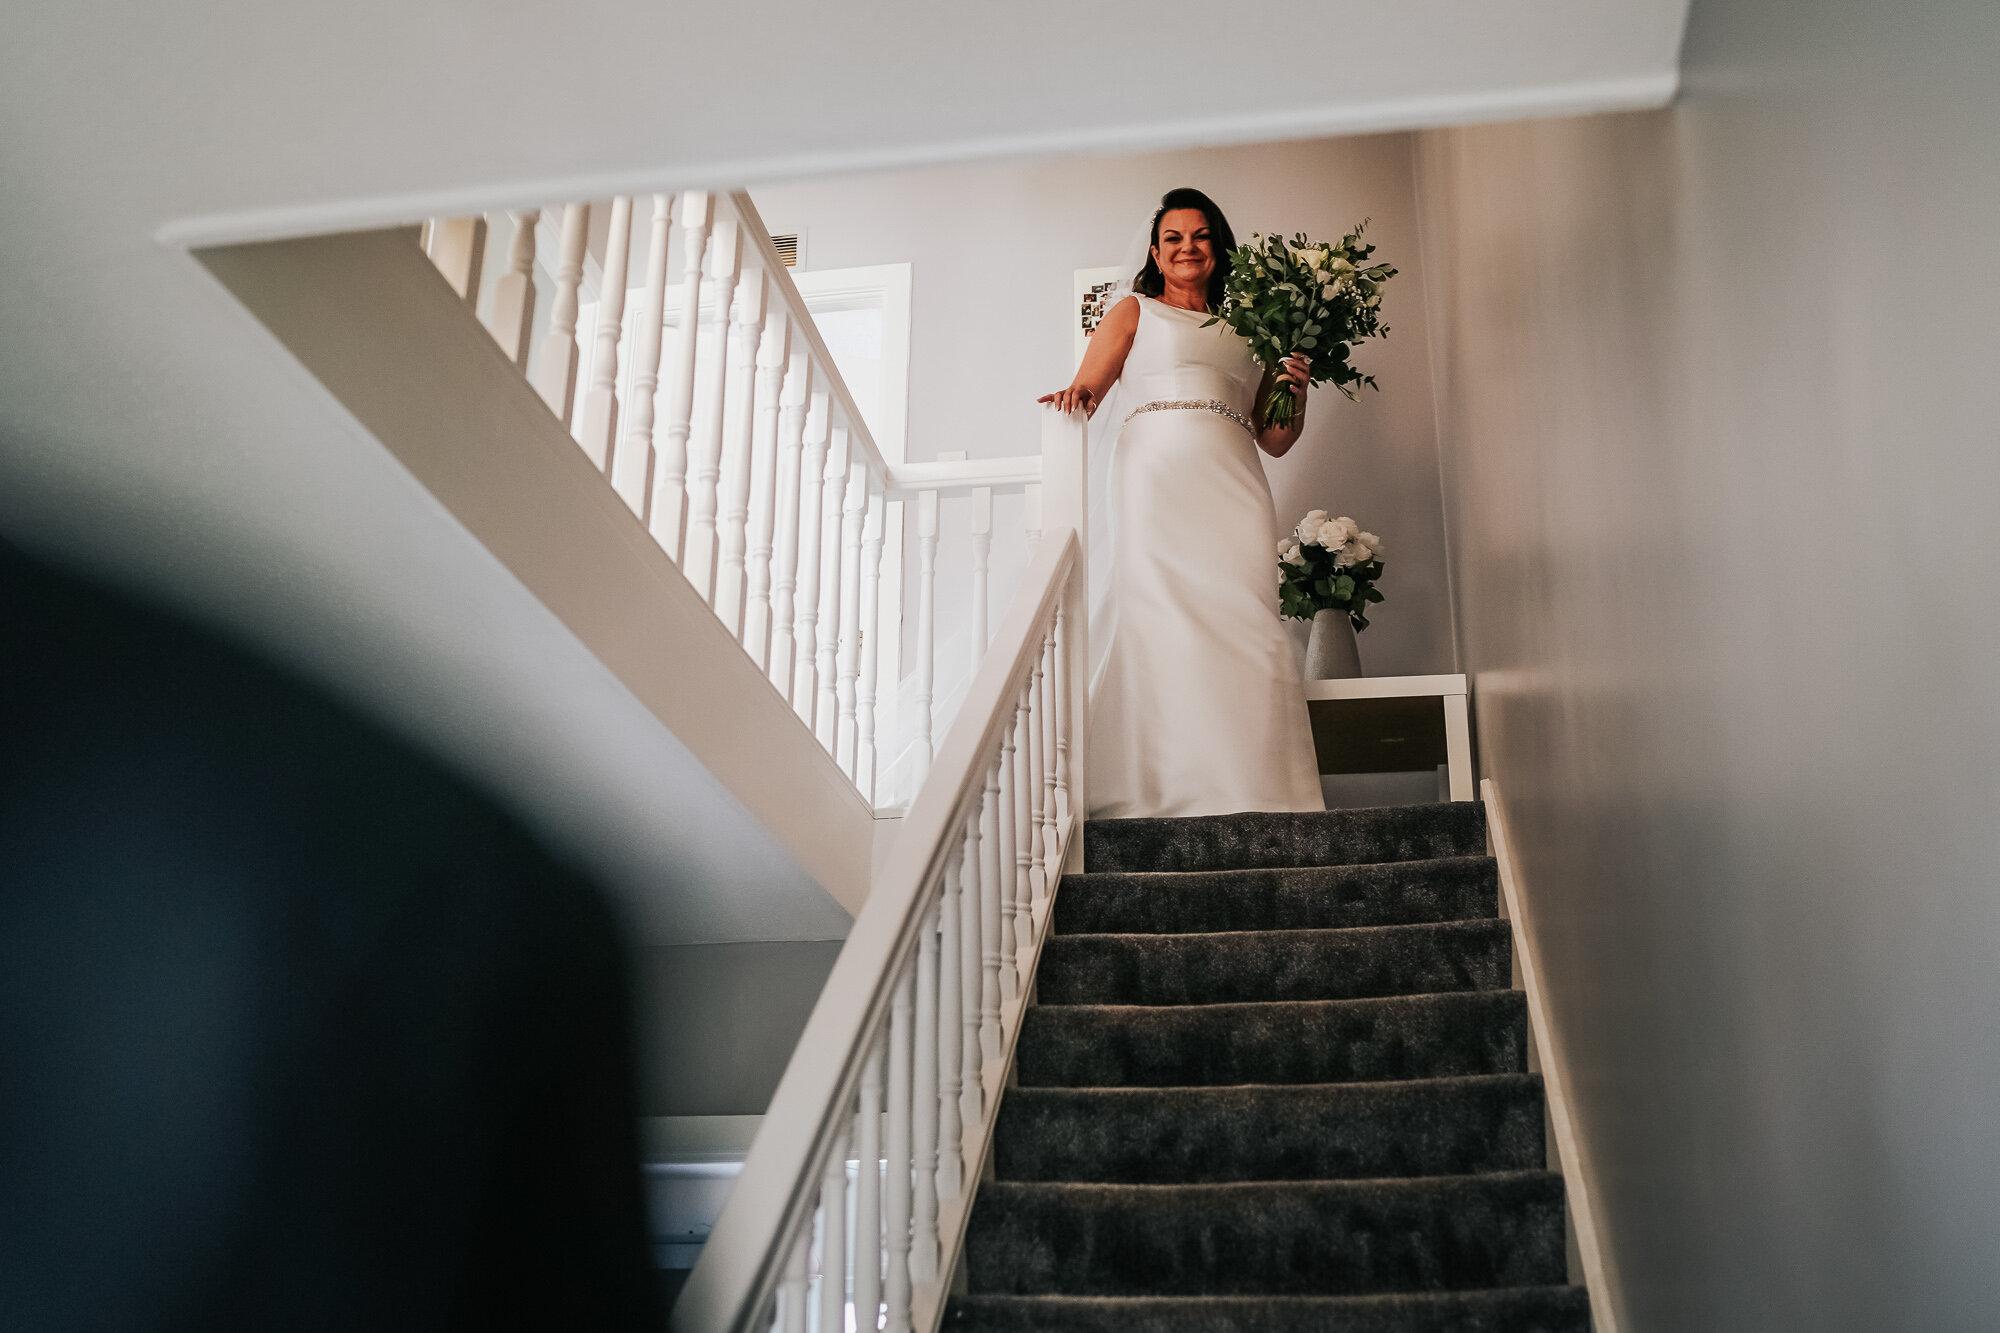 Clontarf Caste wedding photographer Wedding Photography dublin ireland wedding photographer (14 of 58).jpg